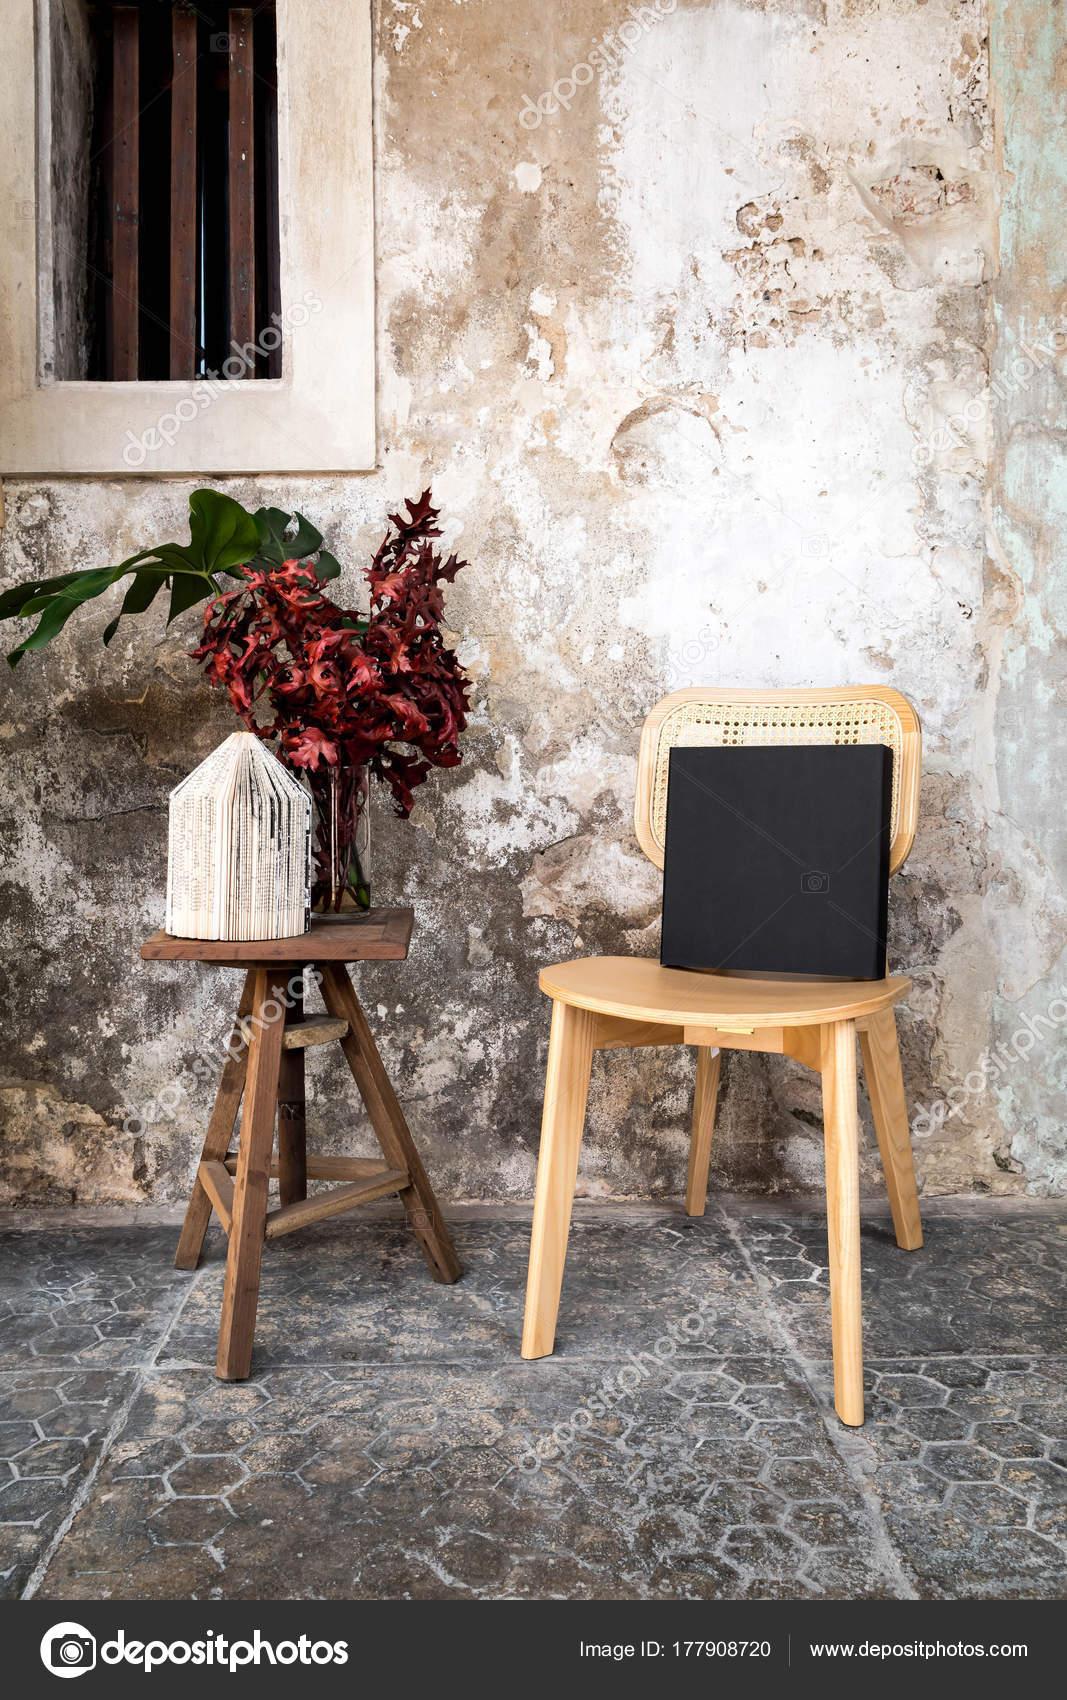 Stuhl dekorieren top mkouo stck makramee hochzeit stuhl bhmische wandbehang dekoration wanddeko - Stuhl dekorieren ...